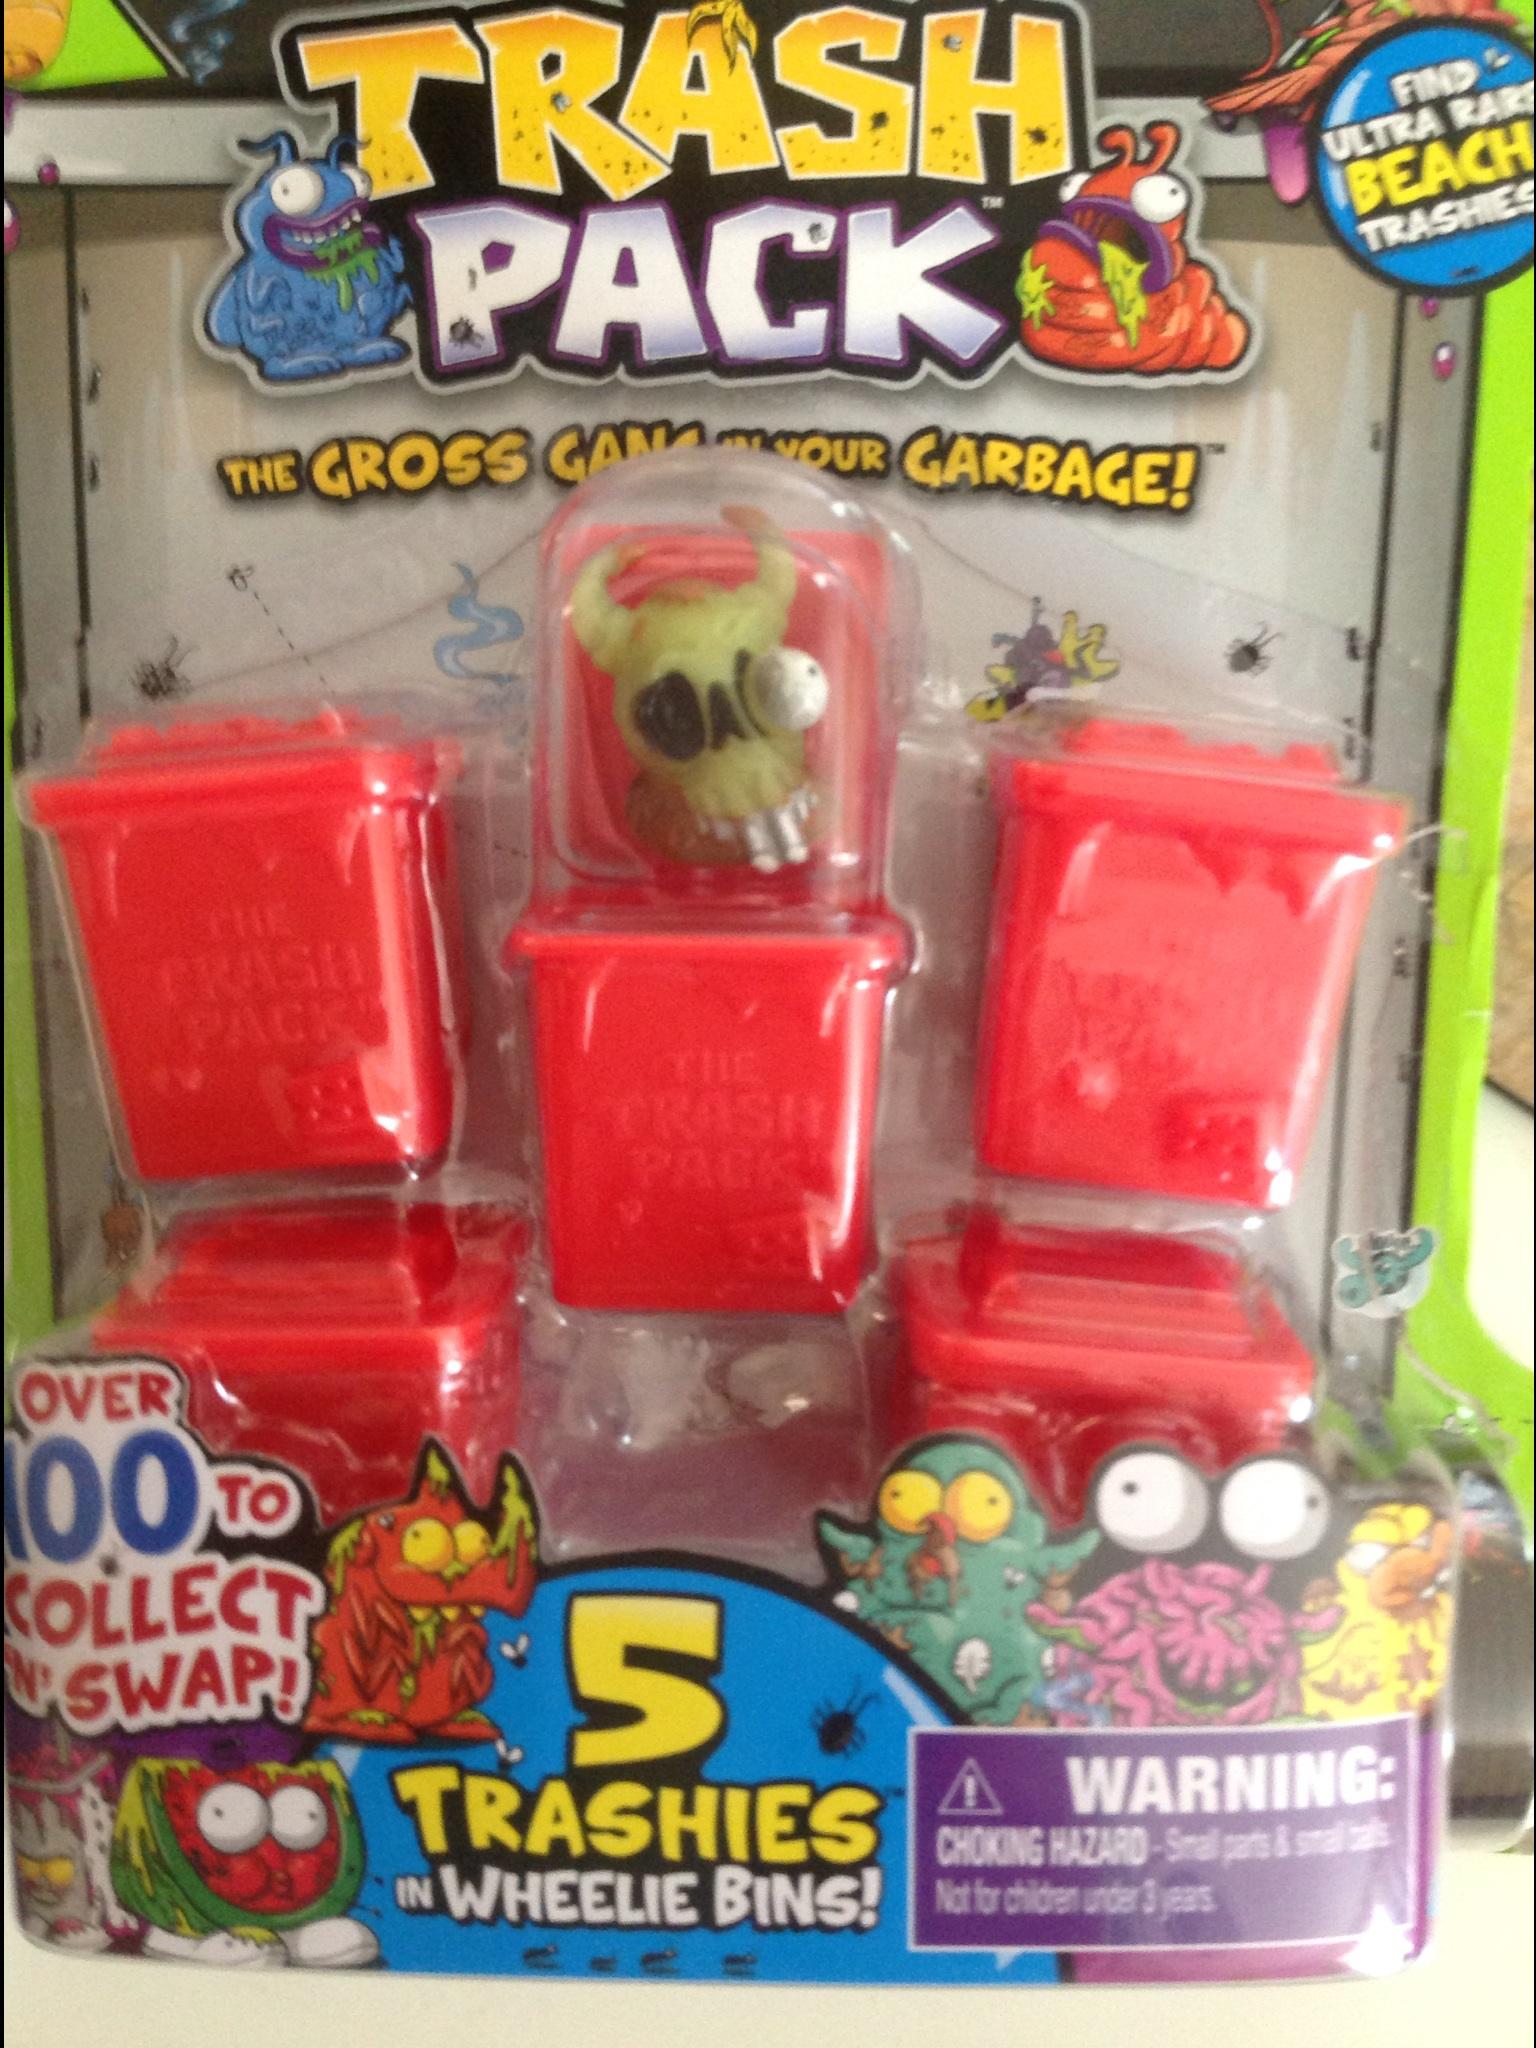 The Trash Pack Y